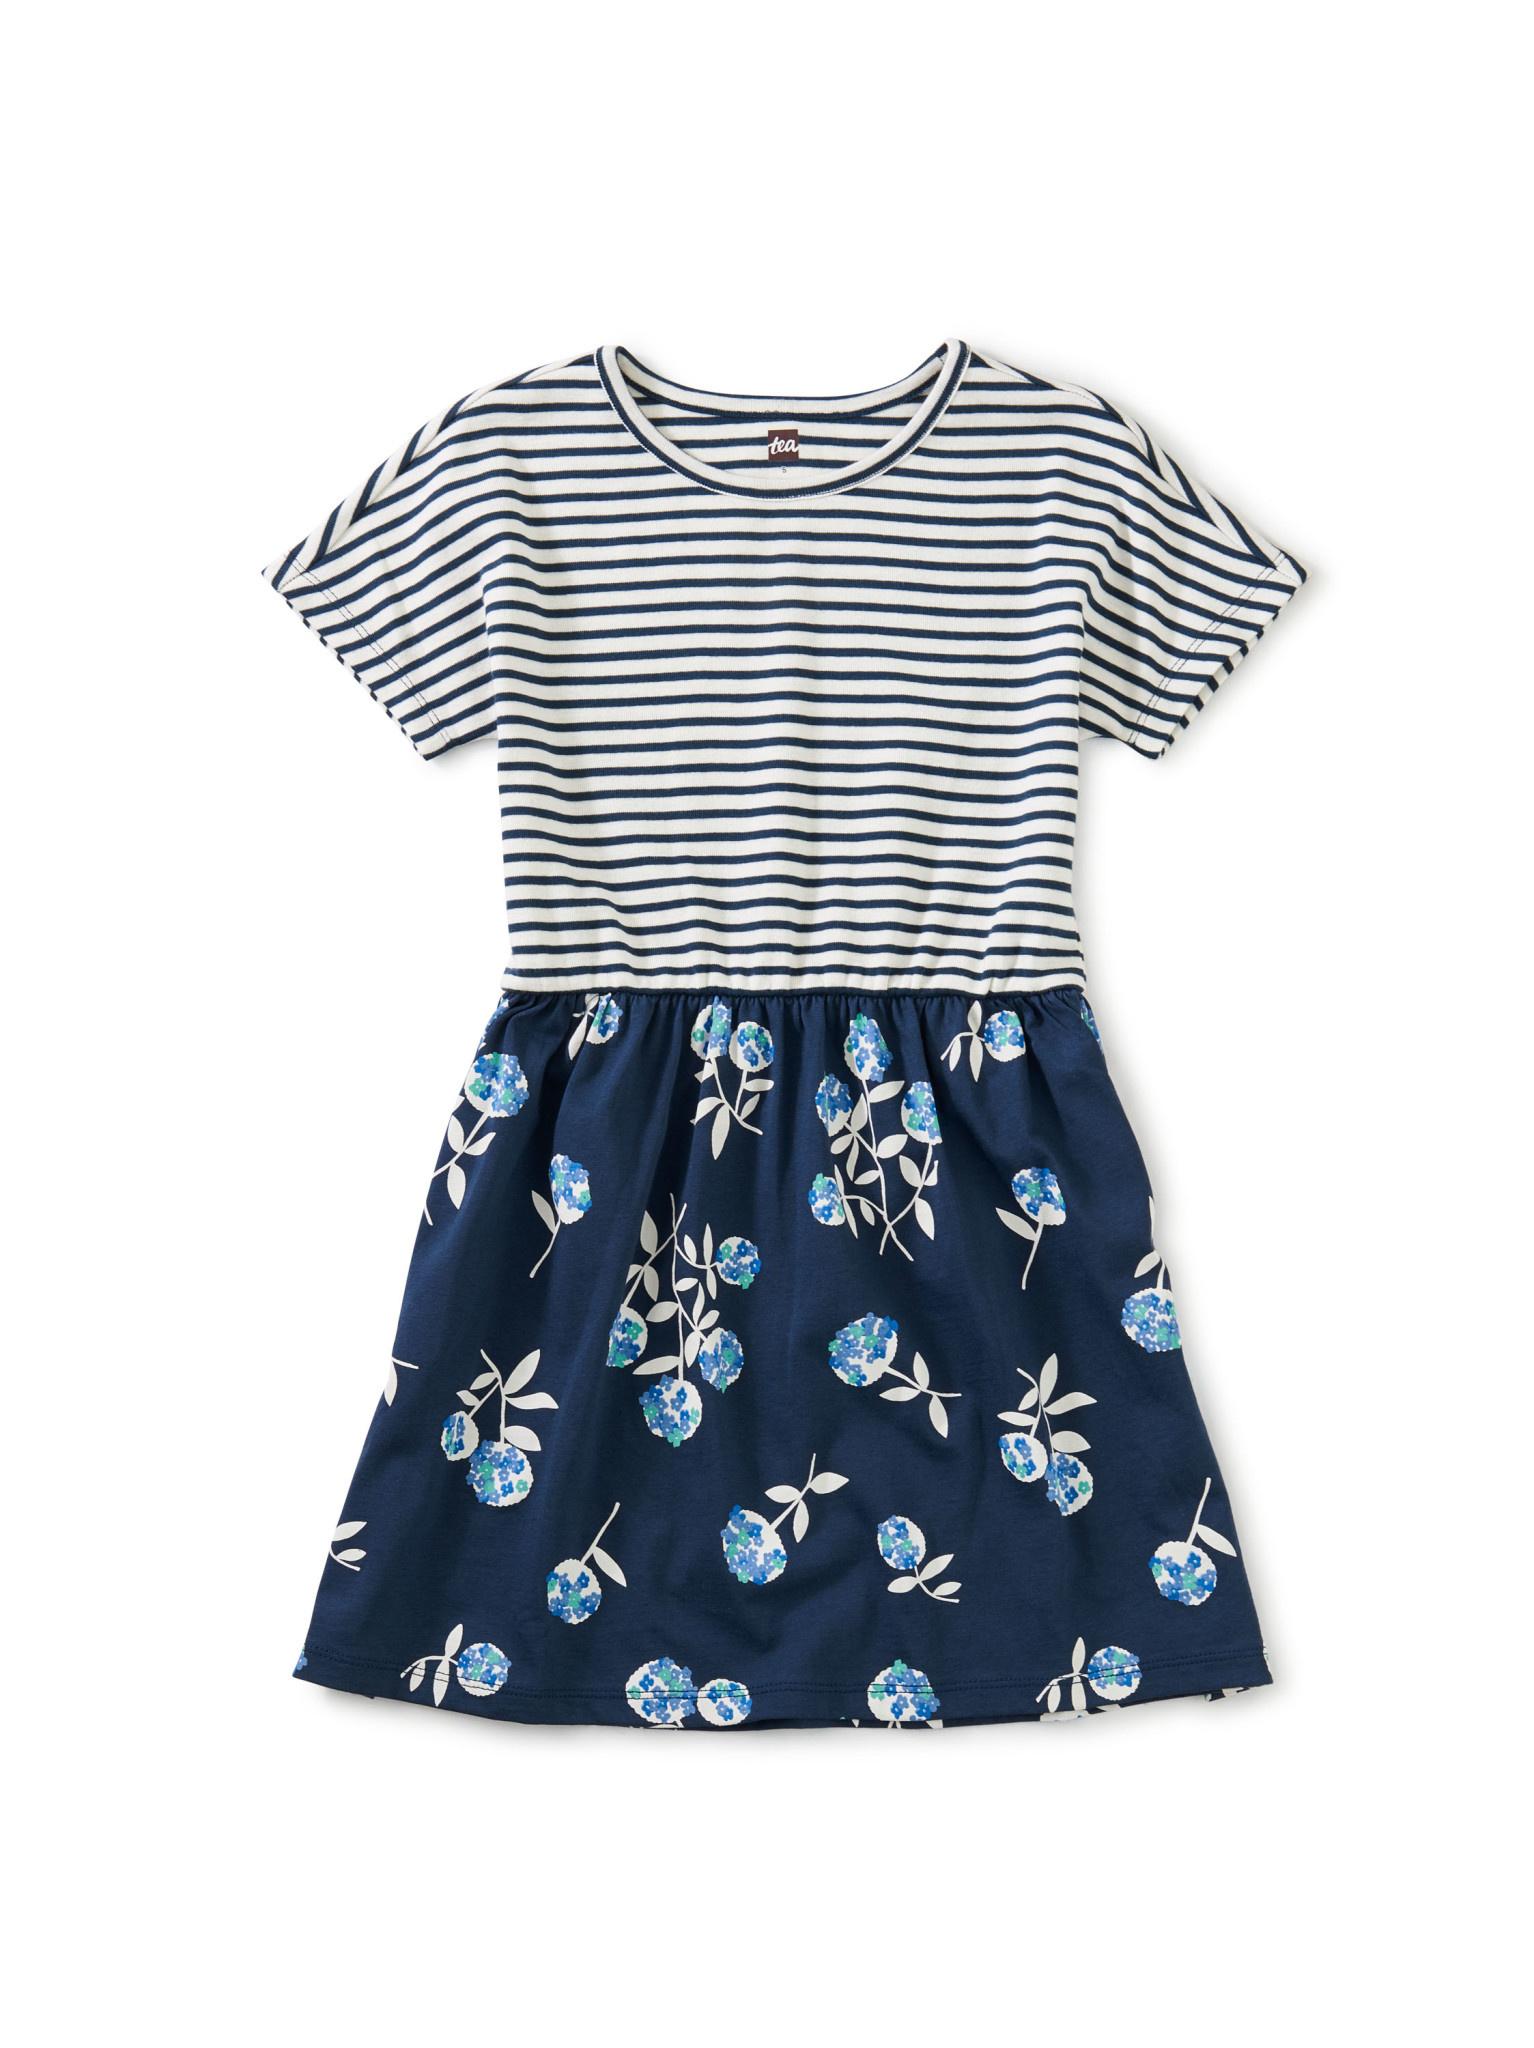 Tea Collection Print Mix Twirl Dress - Flower